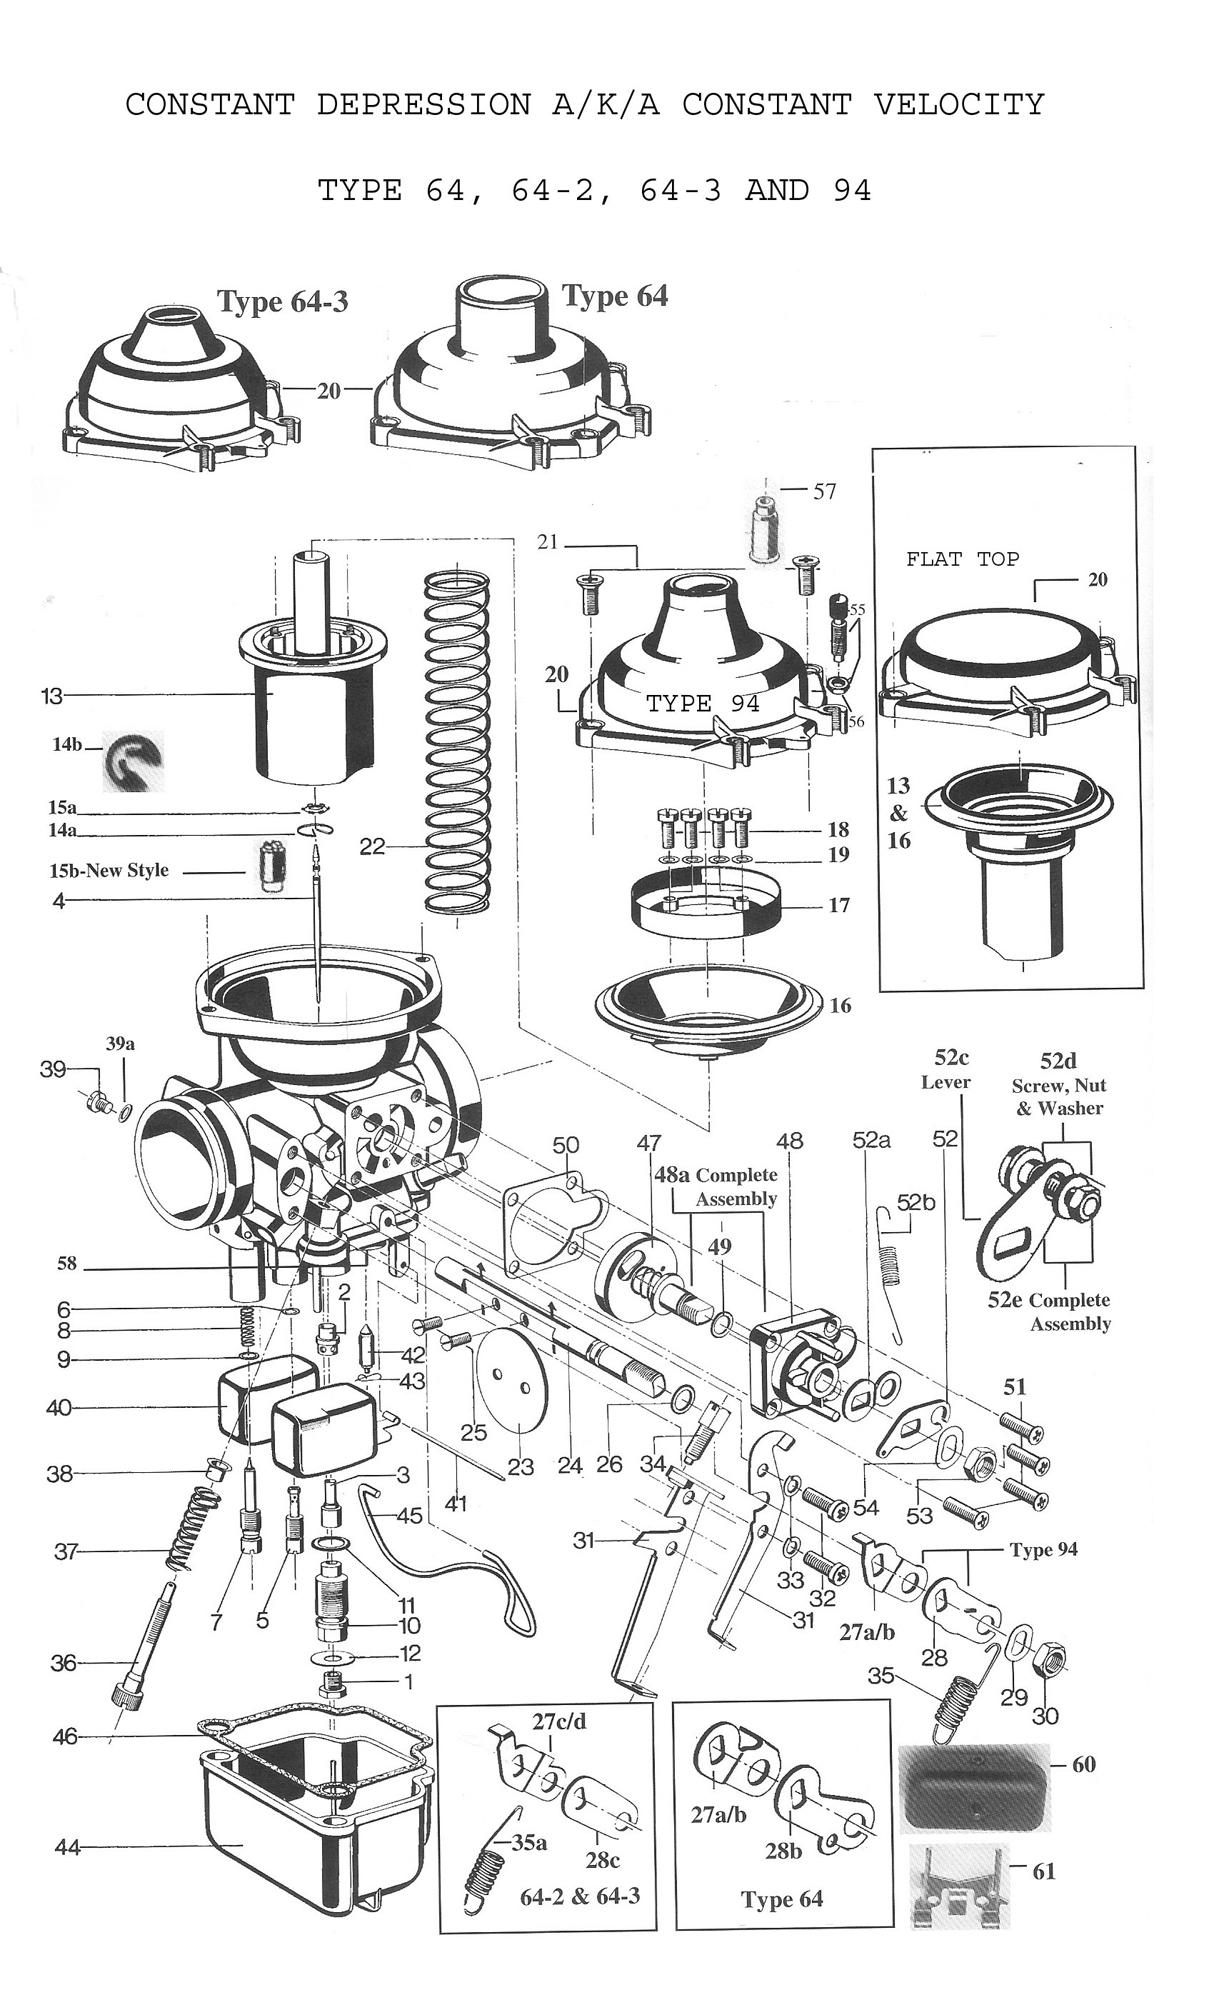 BingAgency_MOTORCYCLE CV EXPLODED VIEW?resize\=665%2C1096 diagrams 747454 wiring diagram spotlights 5 pin relay wiring lightforce wiring diagram at love-stories.co